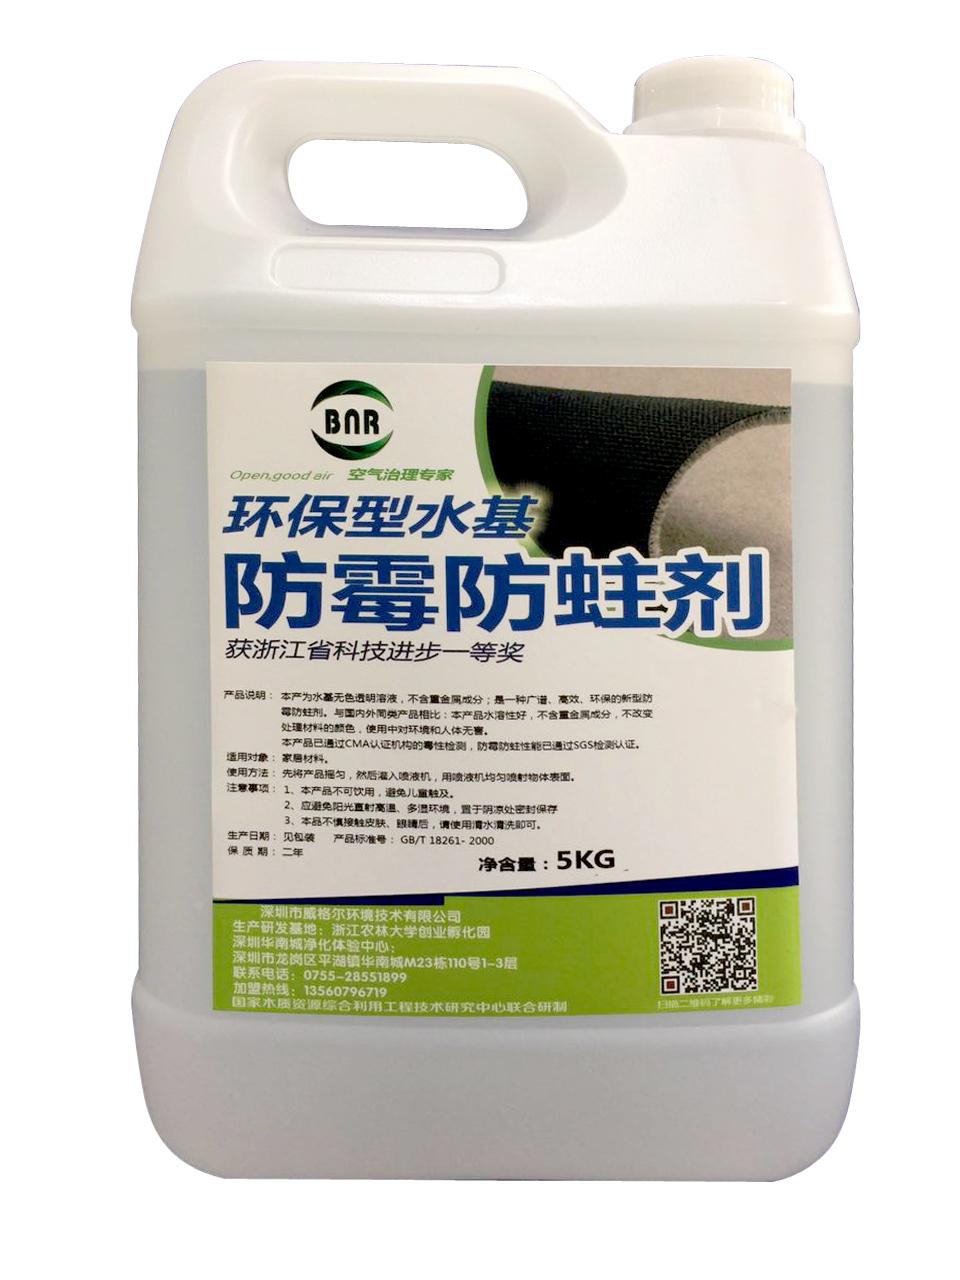 BNR纯植物-防霉防蛀剂